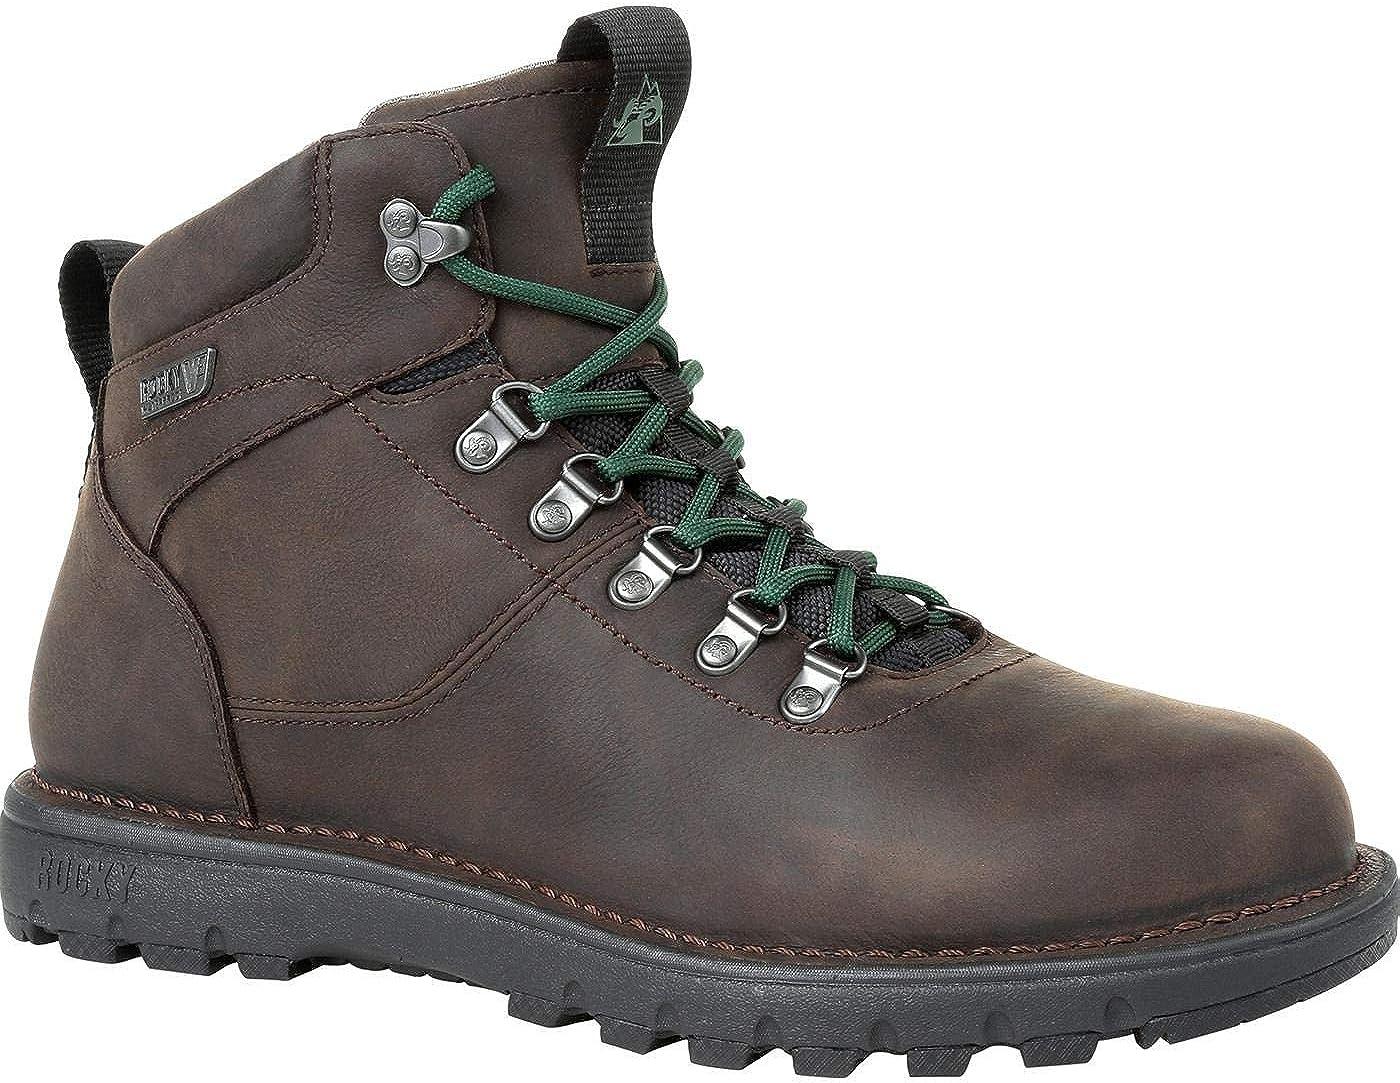 New item Rocky Louisville-Jefferson County Mall Legacy 32 Boot Waterproof Hiking